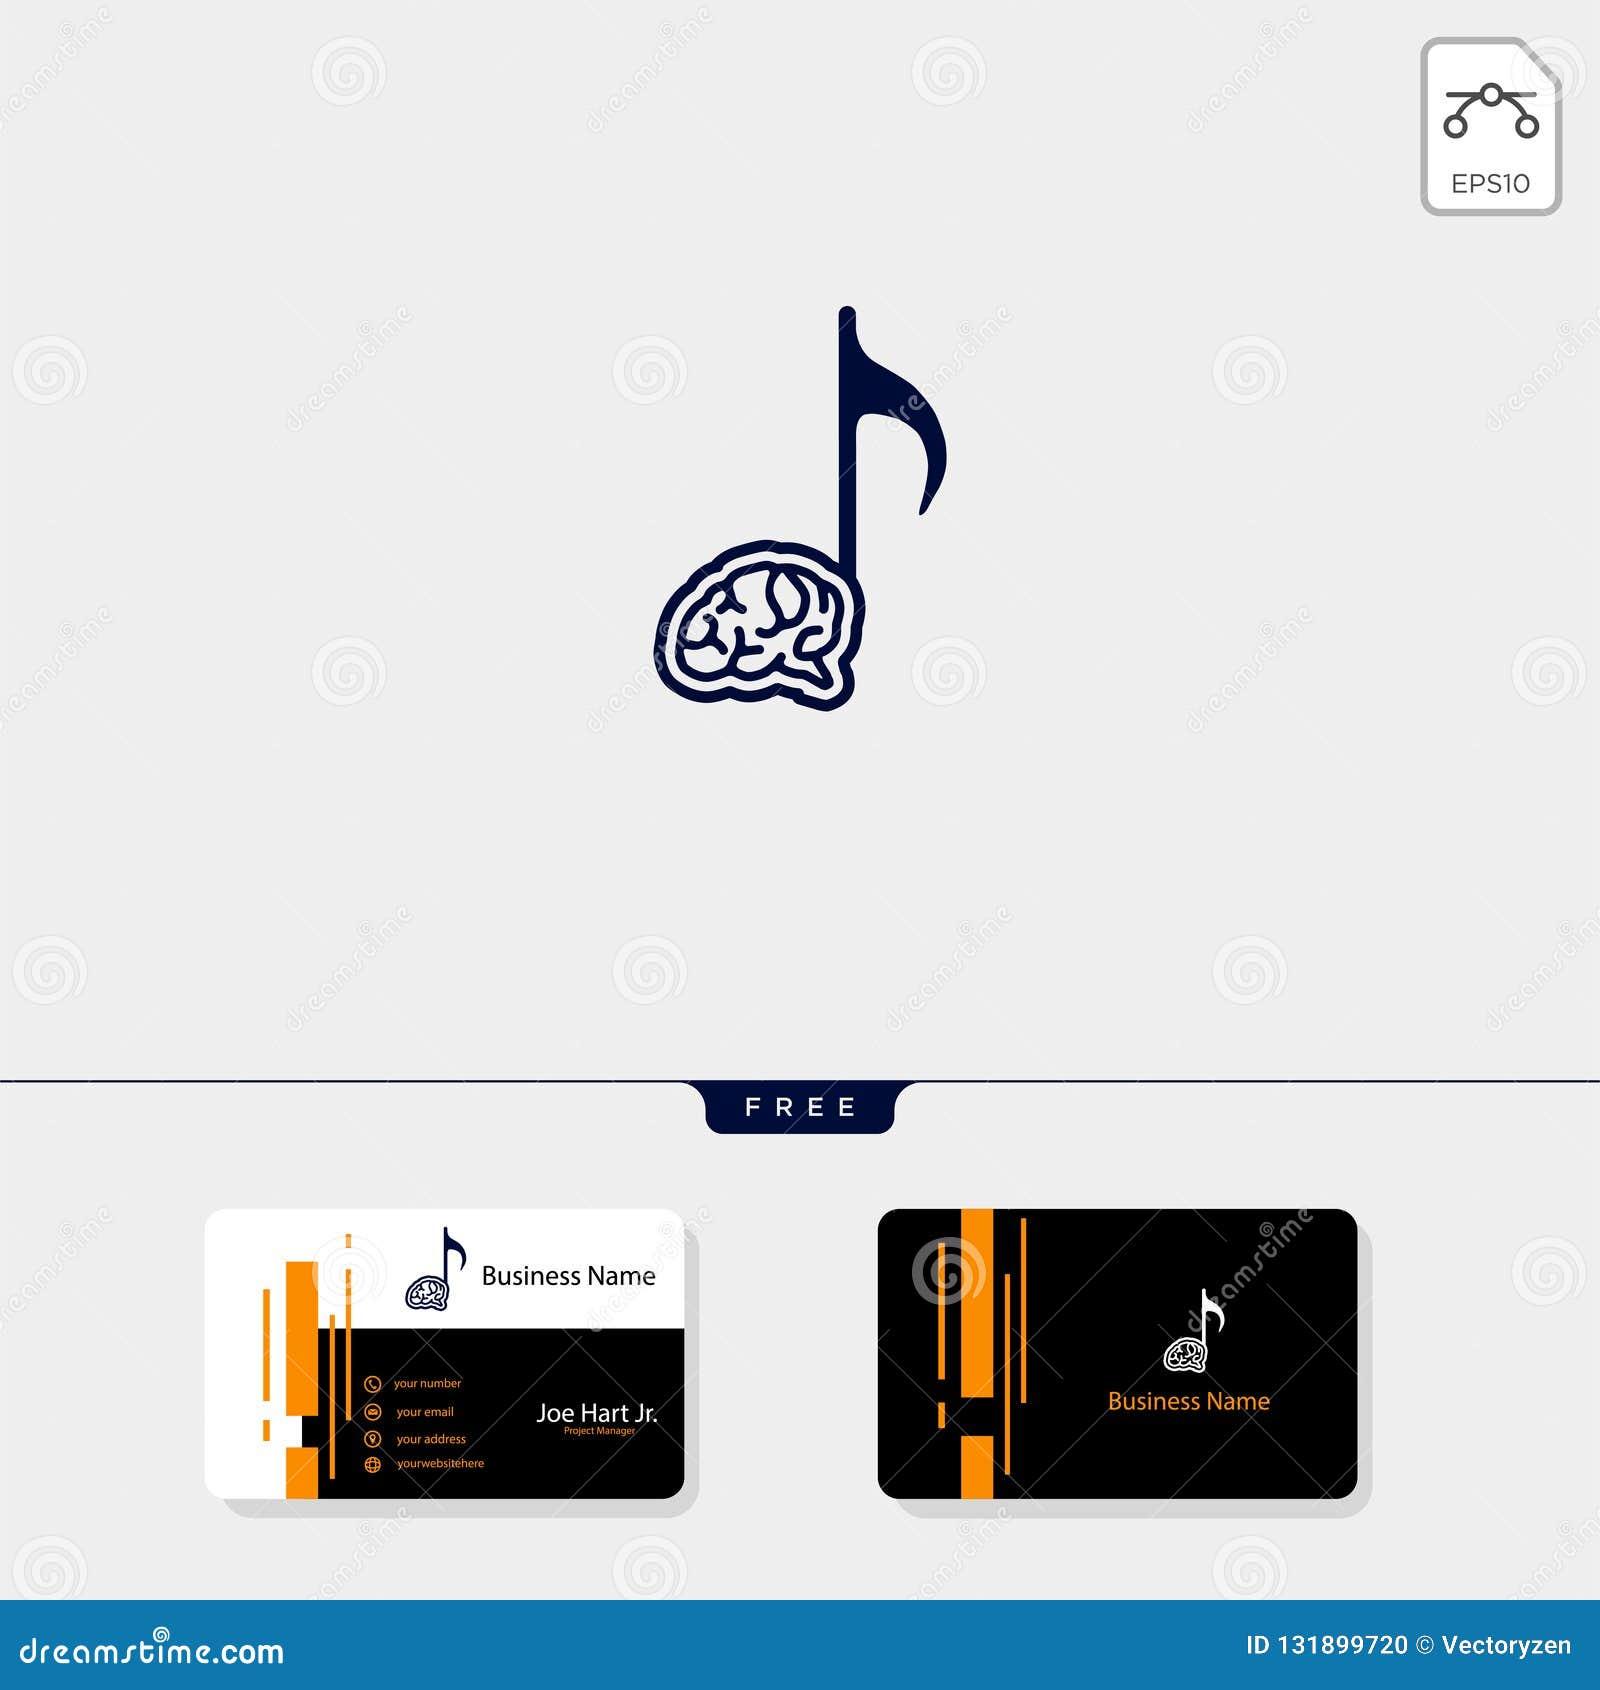 brain music creative logo template get free business card design template